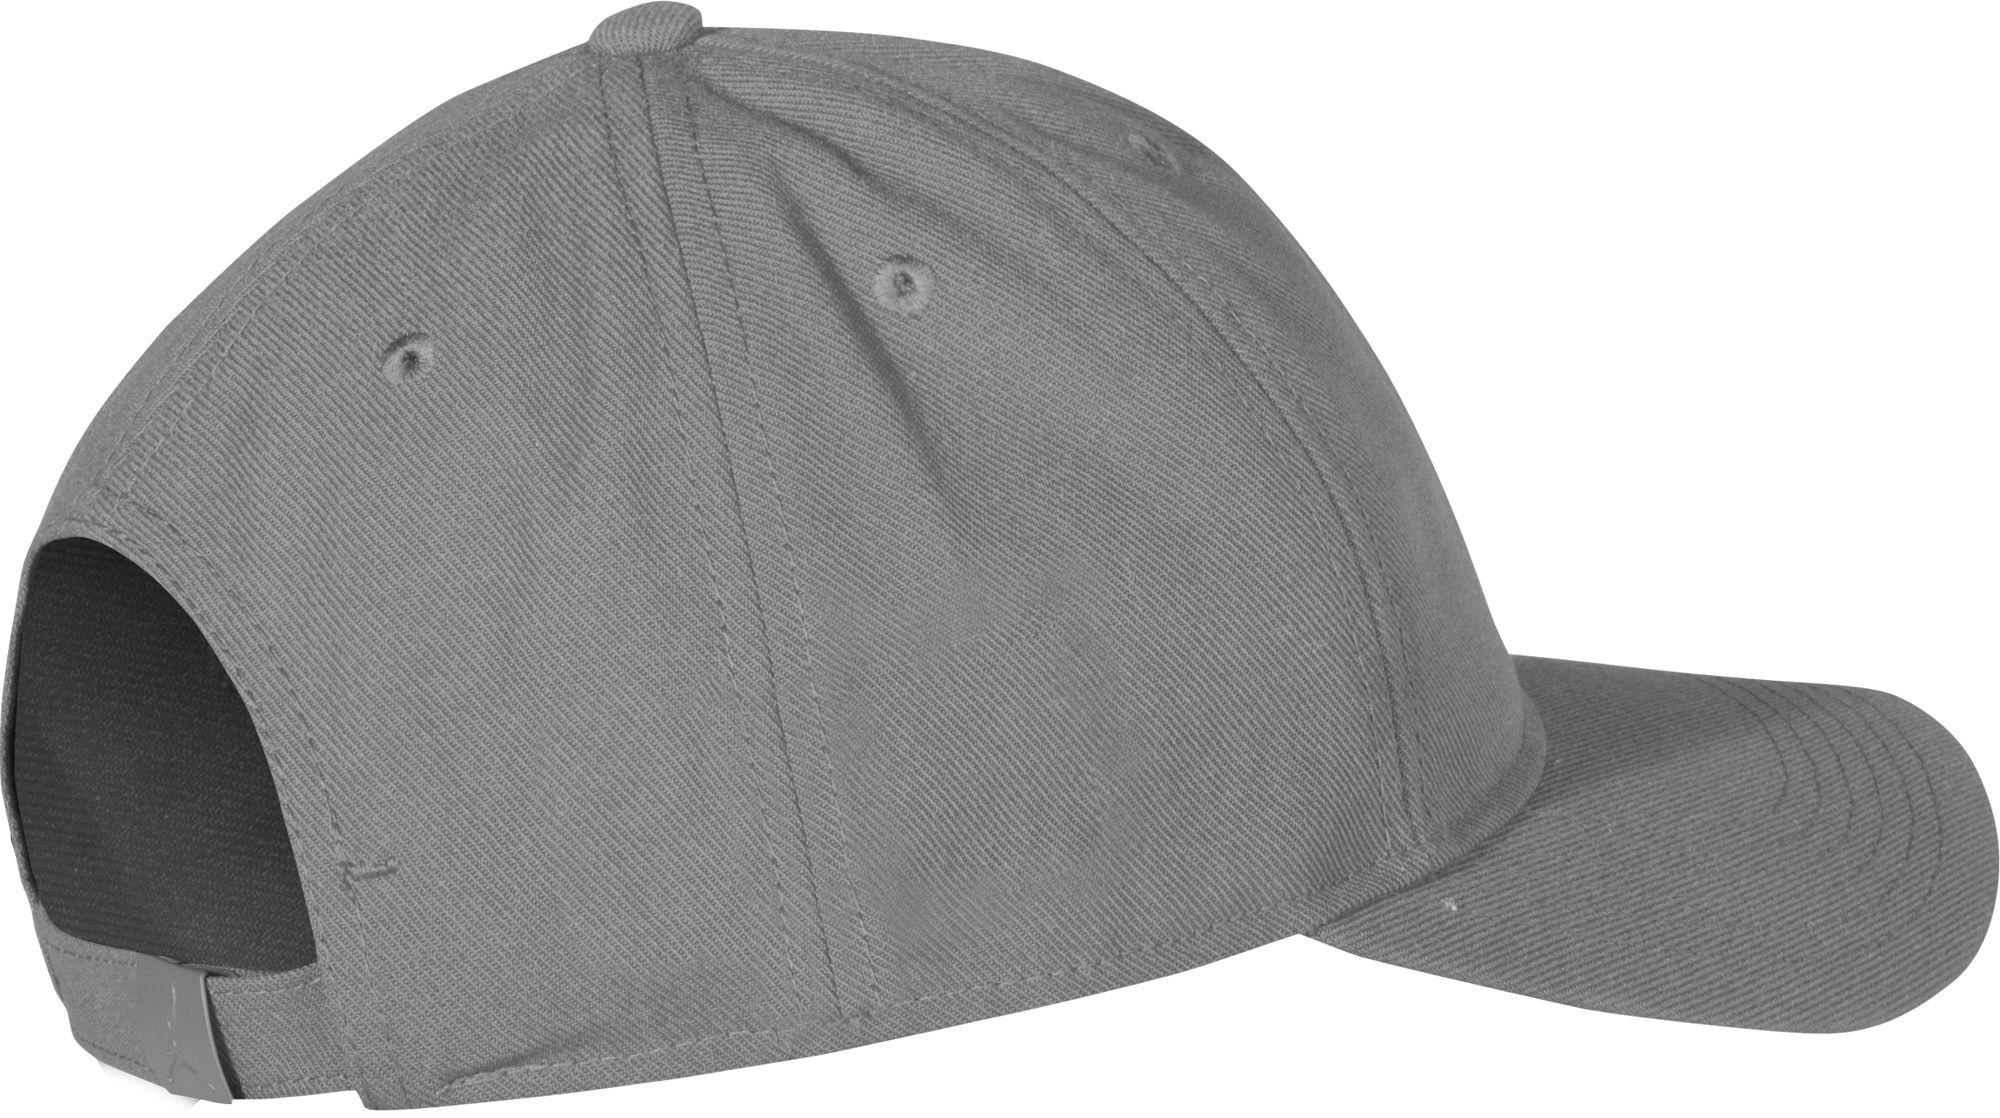 Lyst - Nike Jordan Boys  Jumpman Floppy Snapback Hat in Gray for Men a3277811cdd3